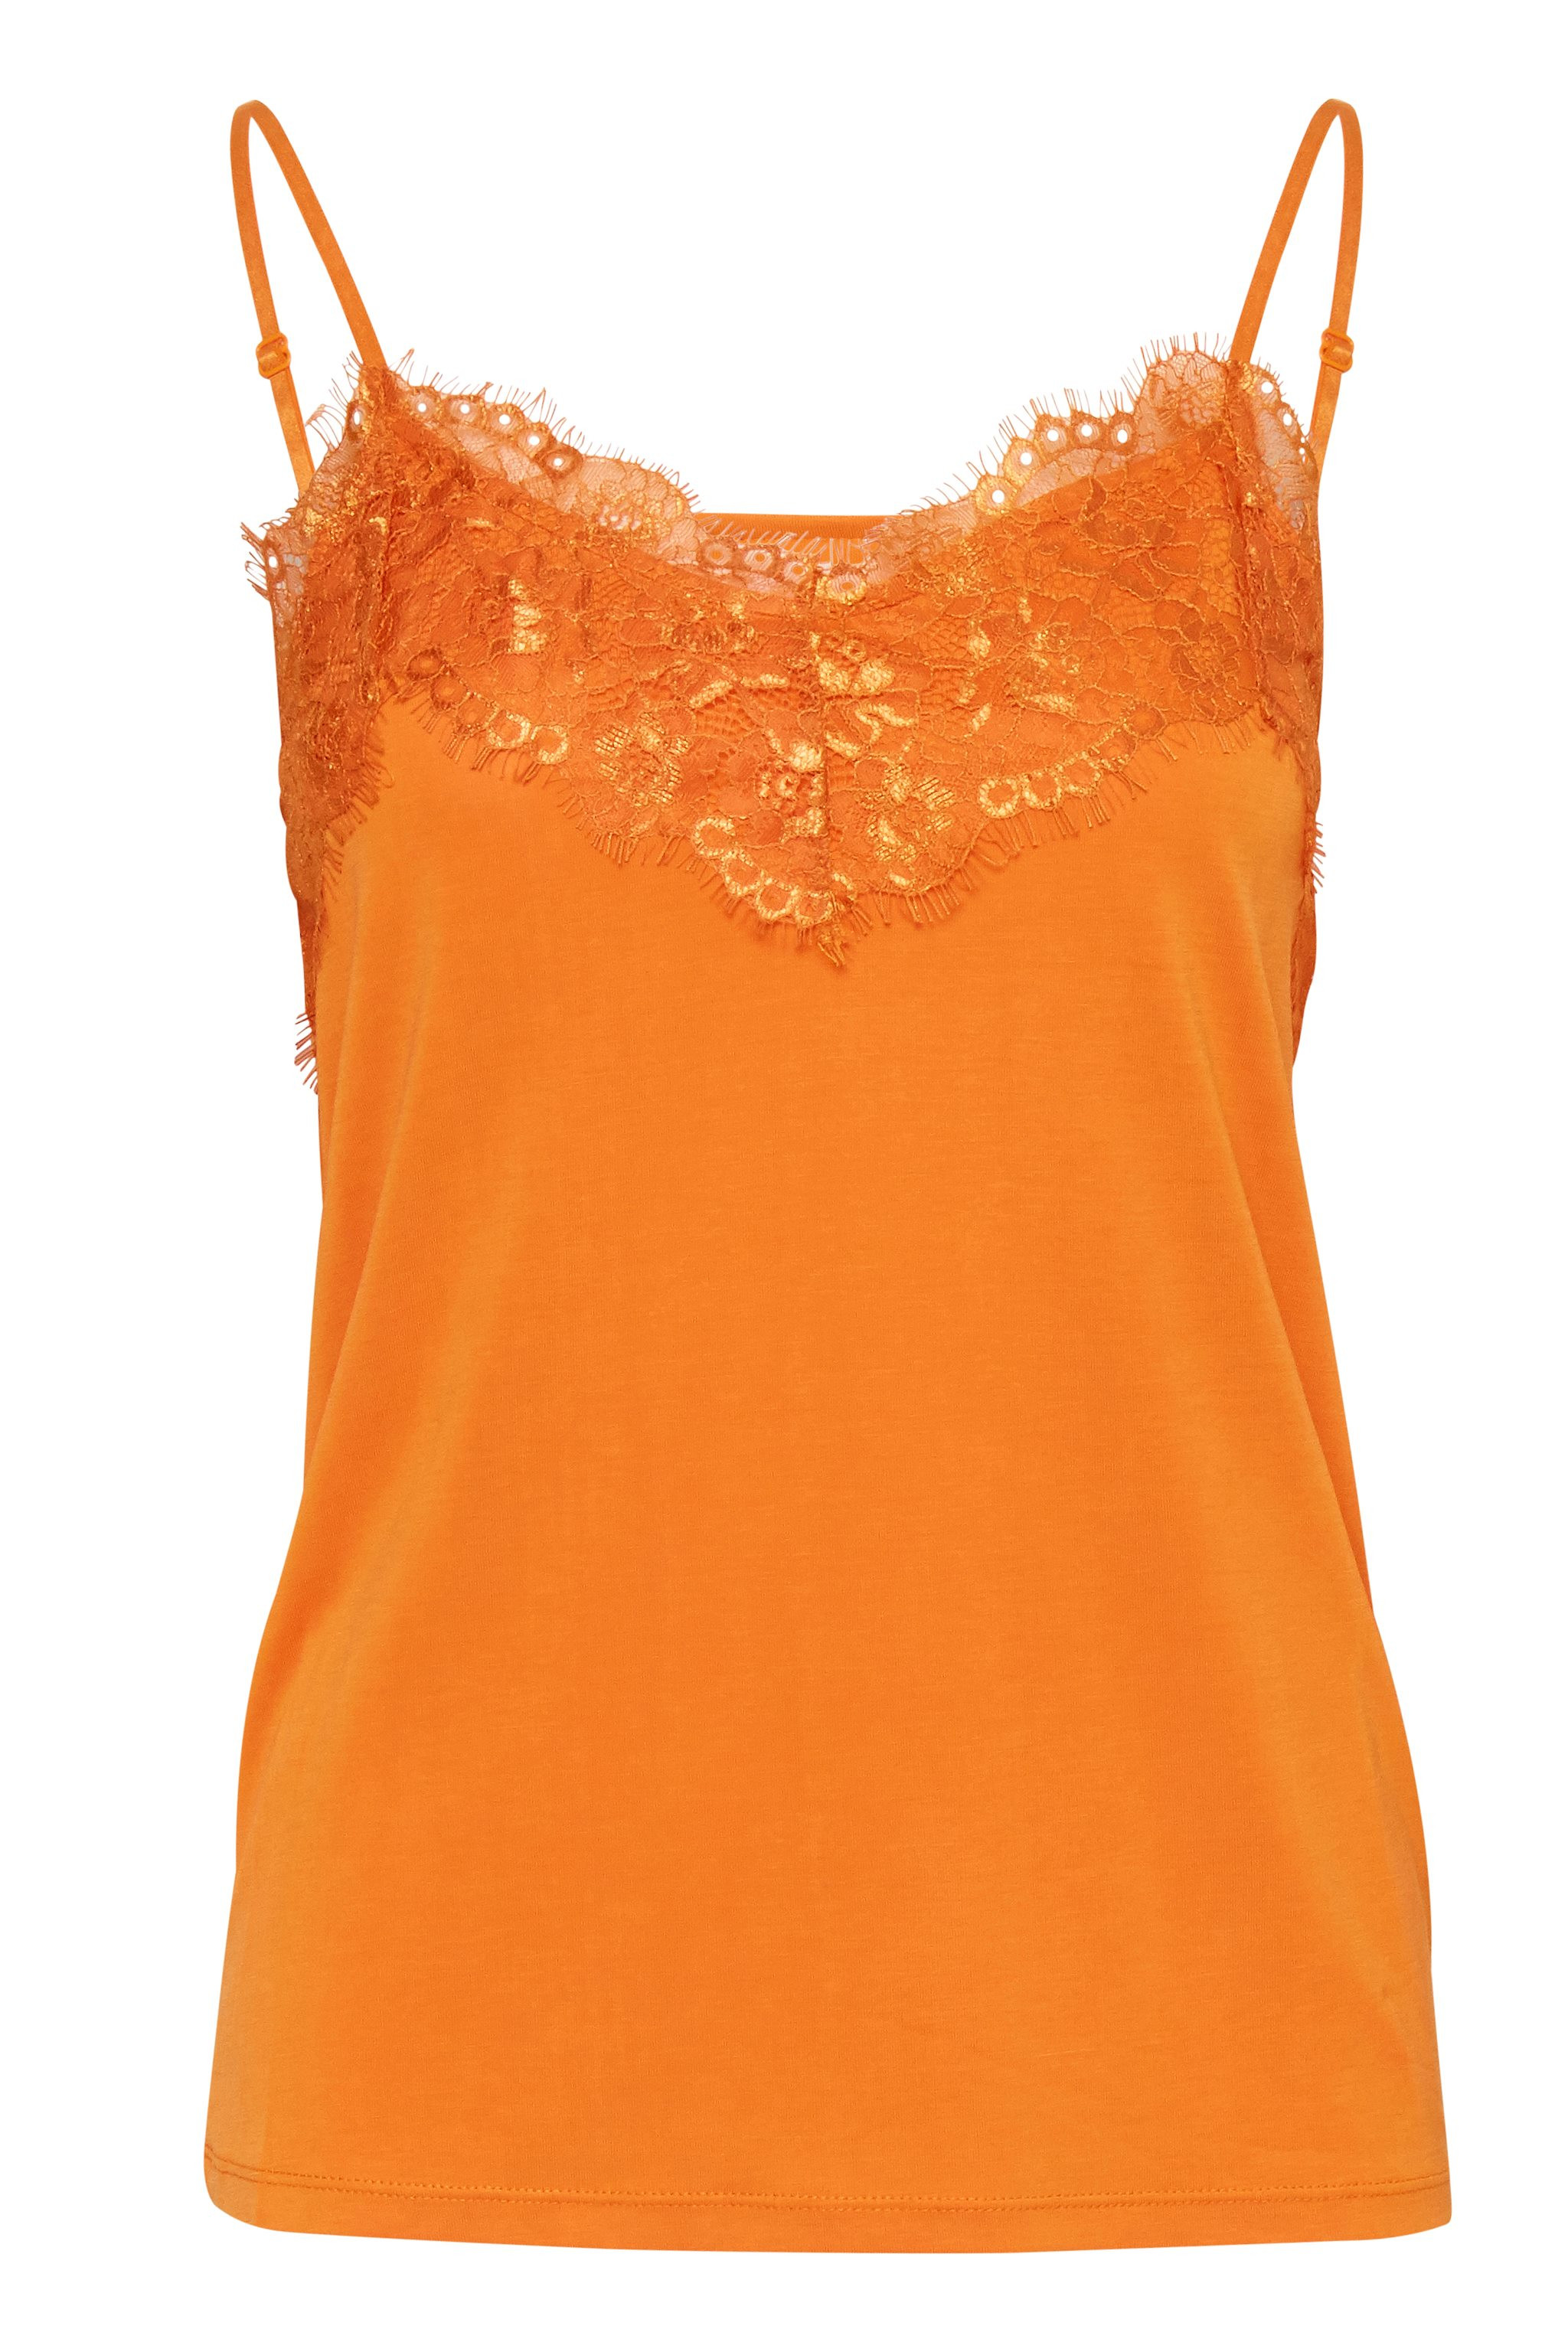 ICHI top i orange